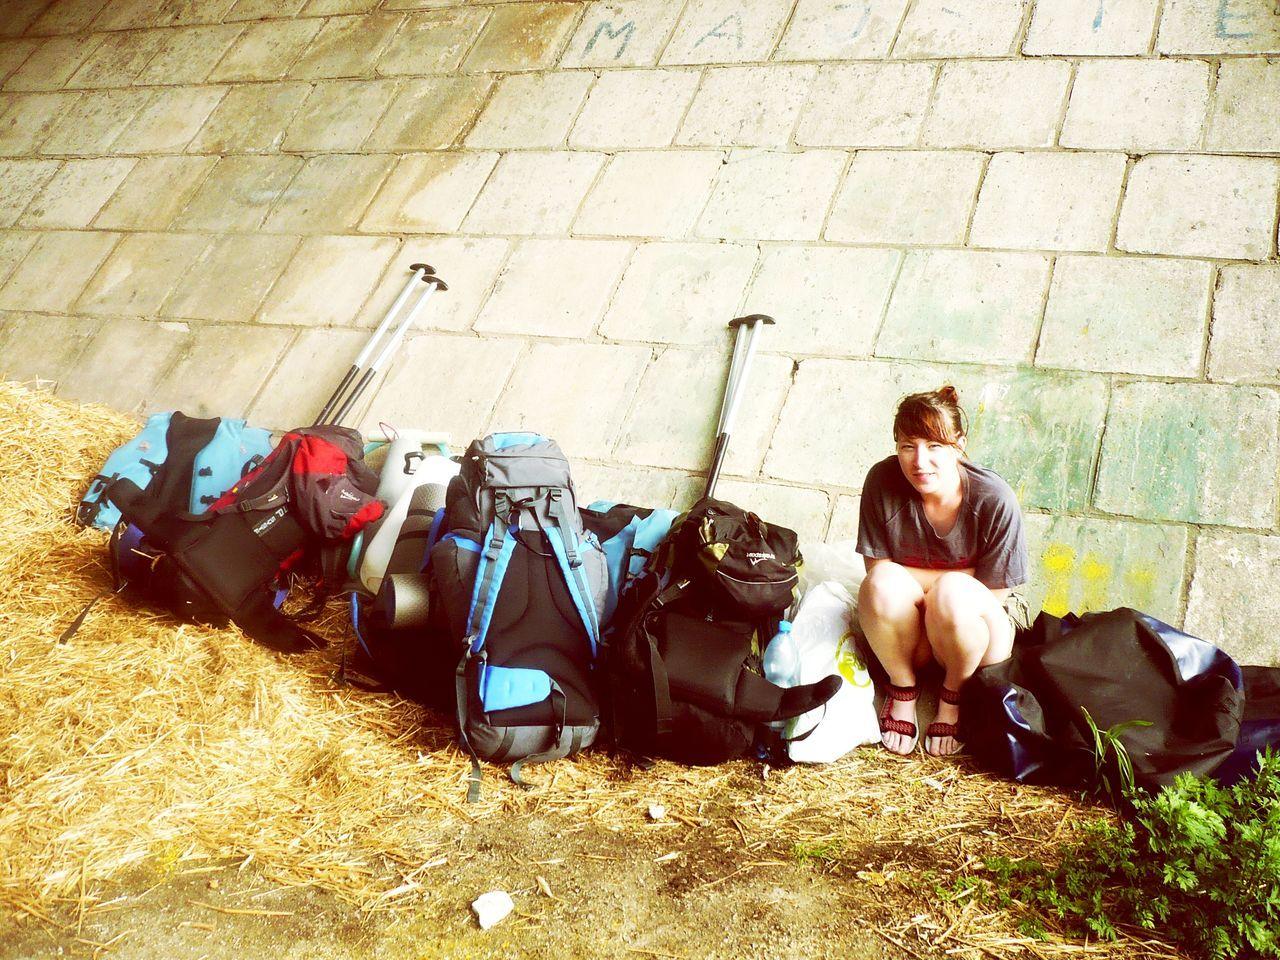 Under Bridge Waiting EyeEmNewHere After Trip Trip Photo Sitting Outdoors Enjoying Life ♥ Rainy Weather Rain Day Rain☔